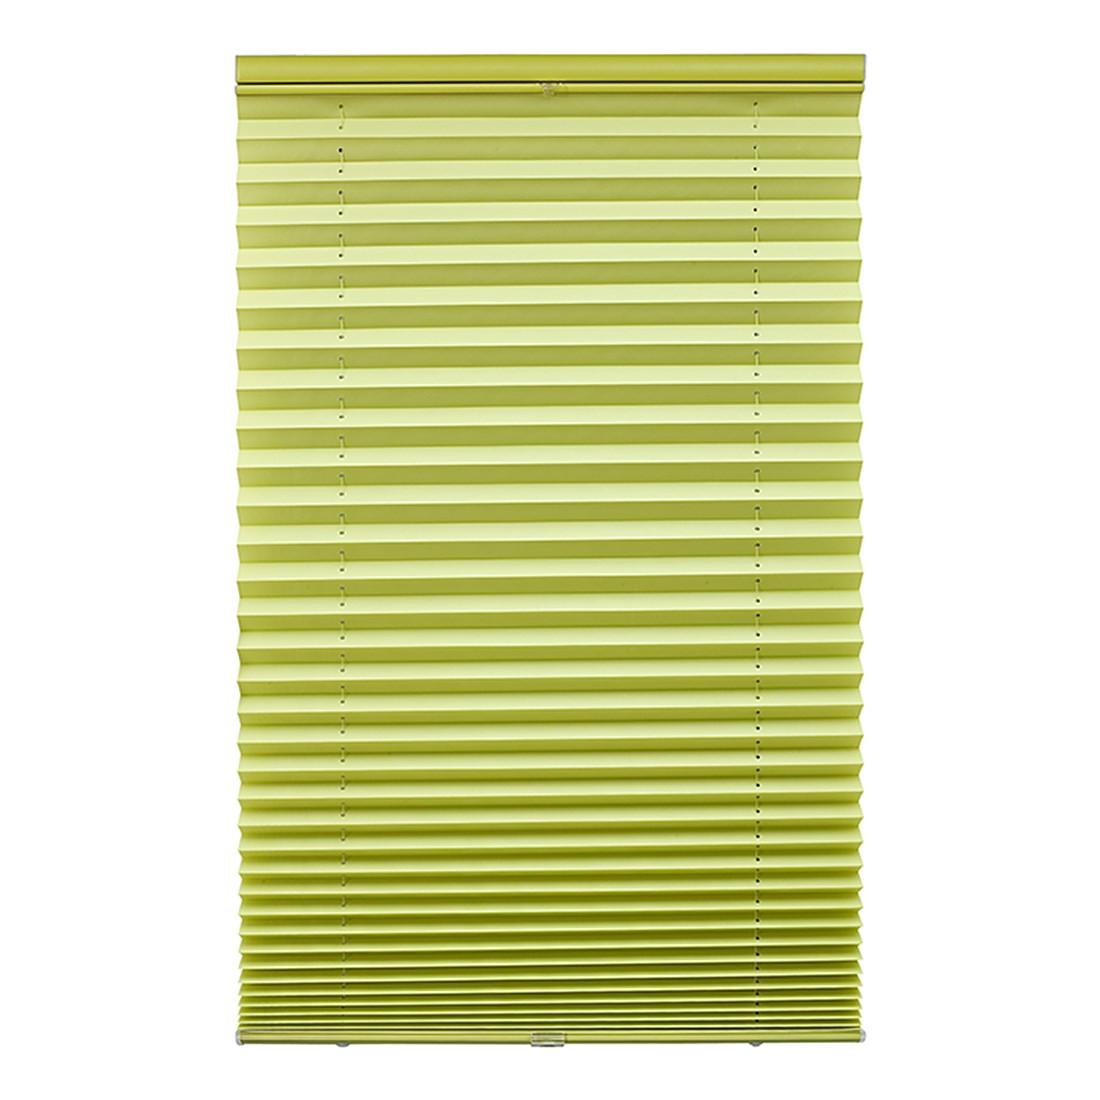 Plissee Klemmfix – Polyester, Metall Grün – (H x B): 130 x 80 cm, Wohn-Guide günstig